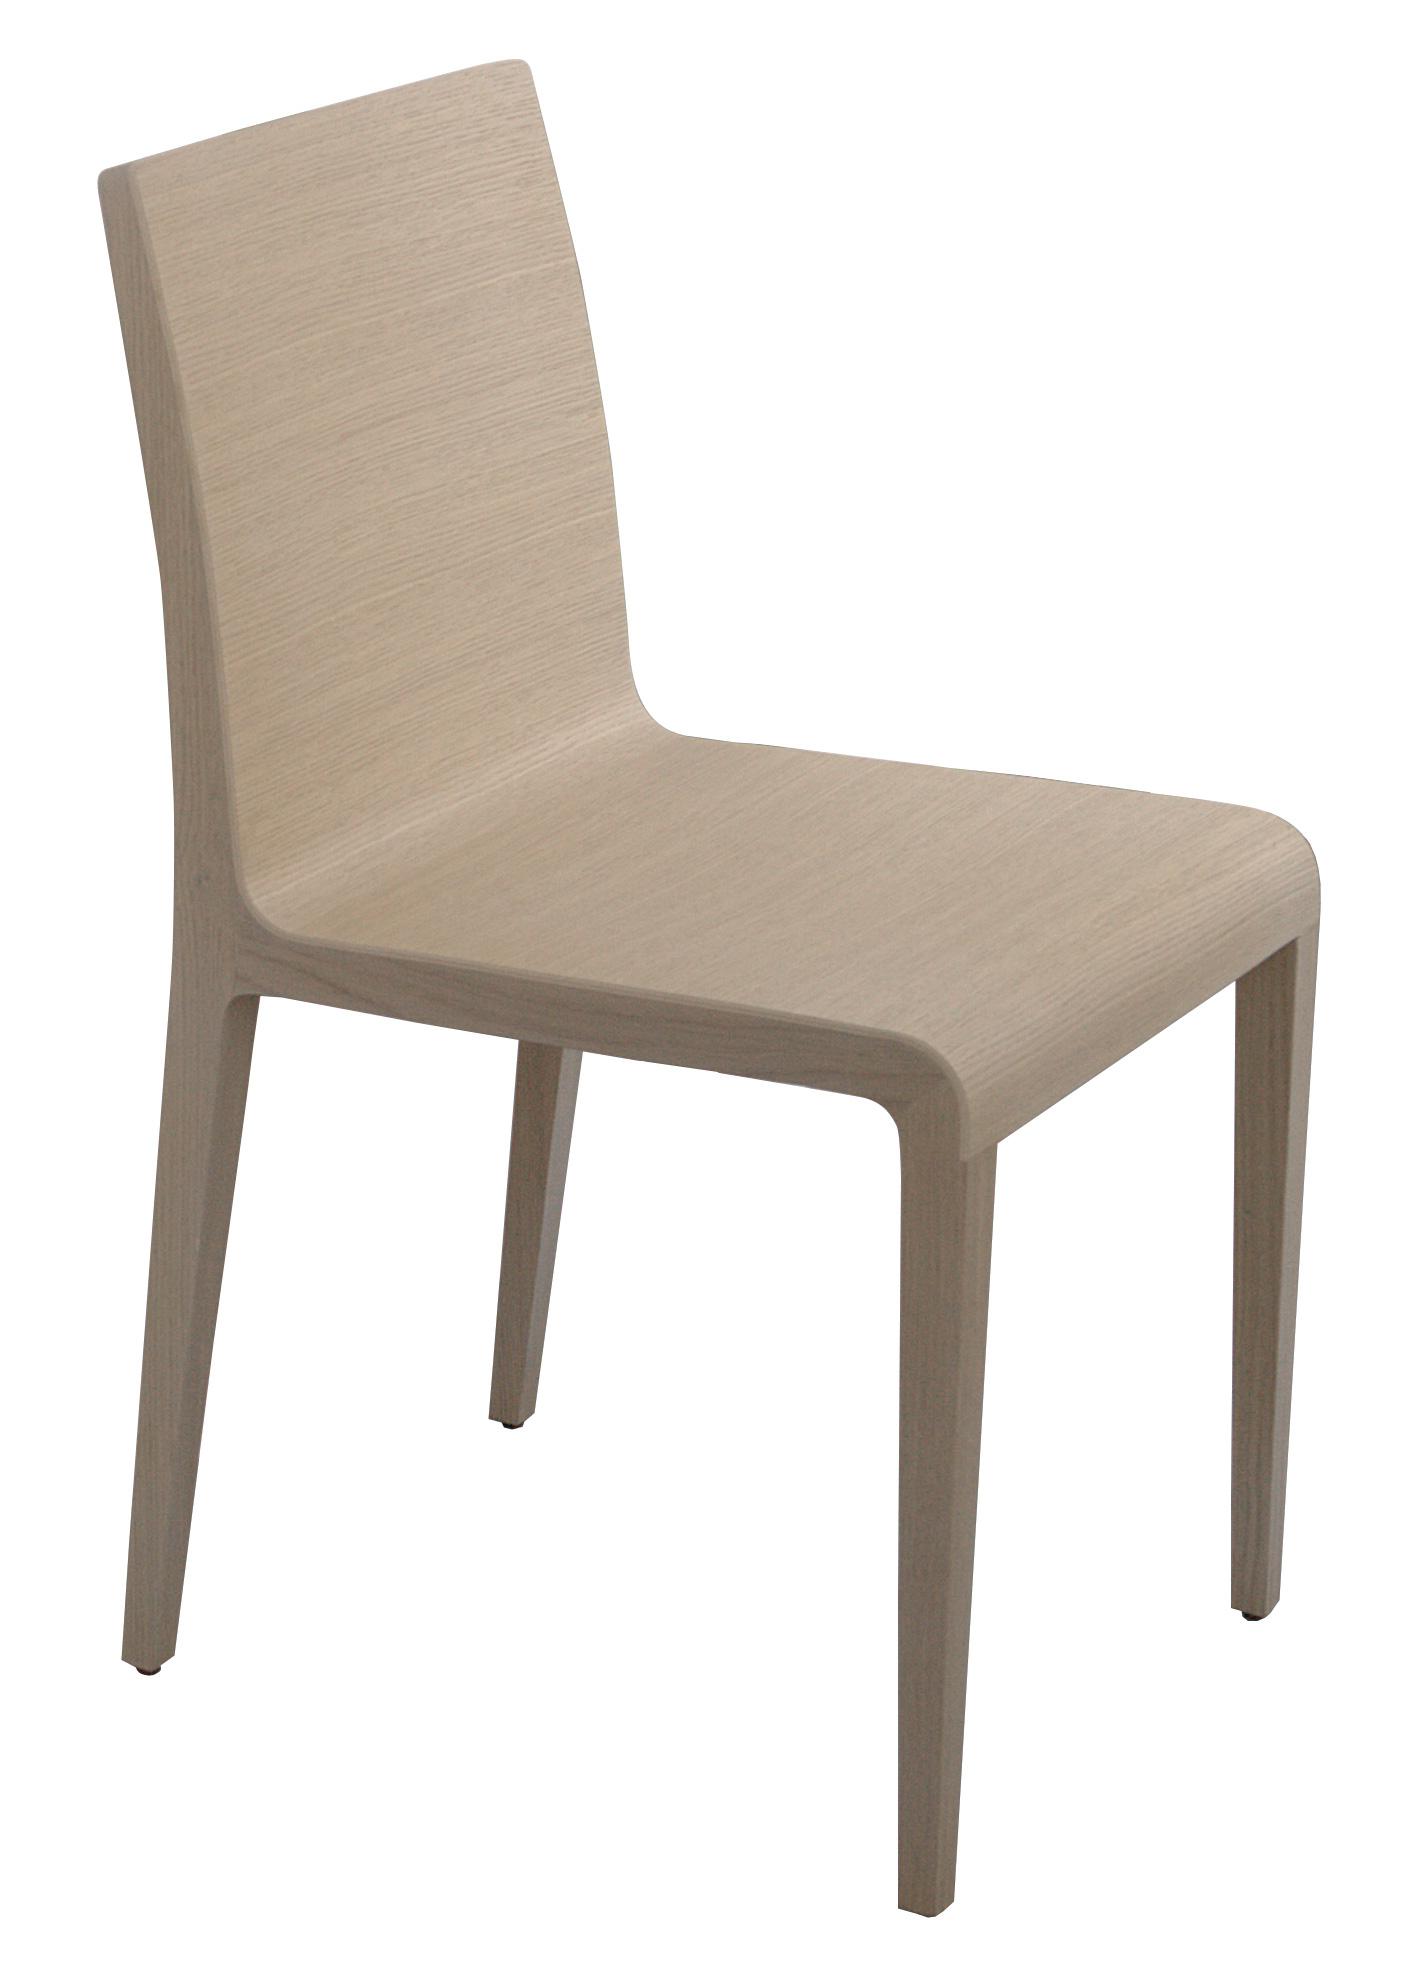 YOUNG - Franchi Sedie - sedie, sgabelli, ufficio, tavoli ...